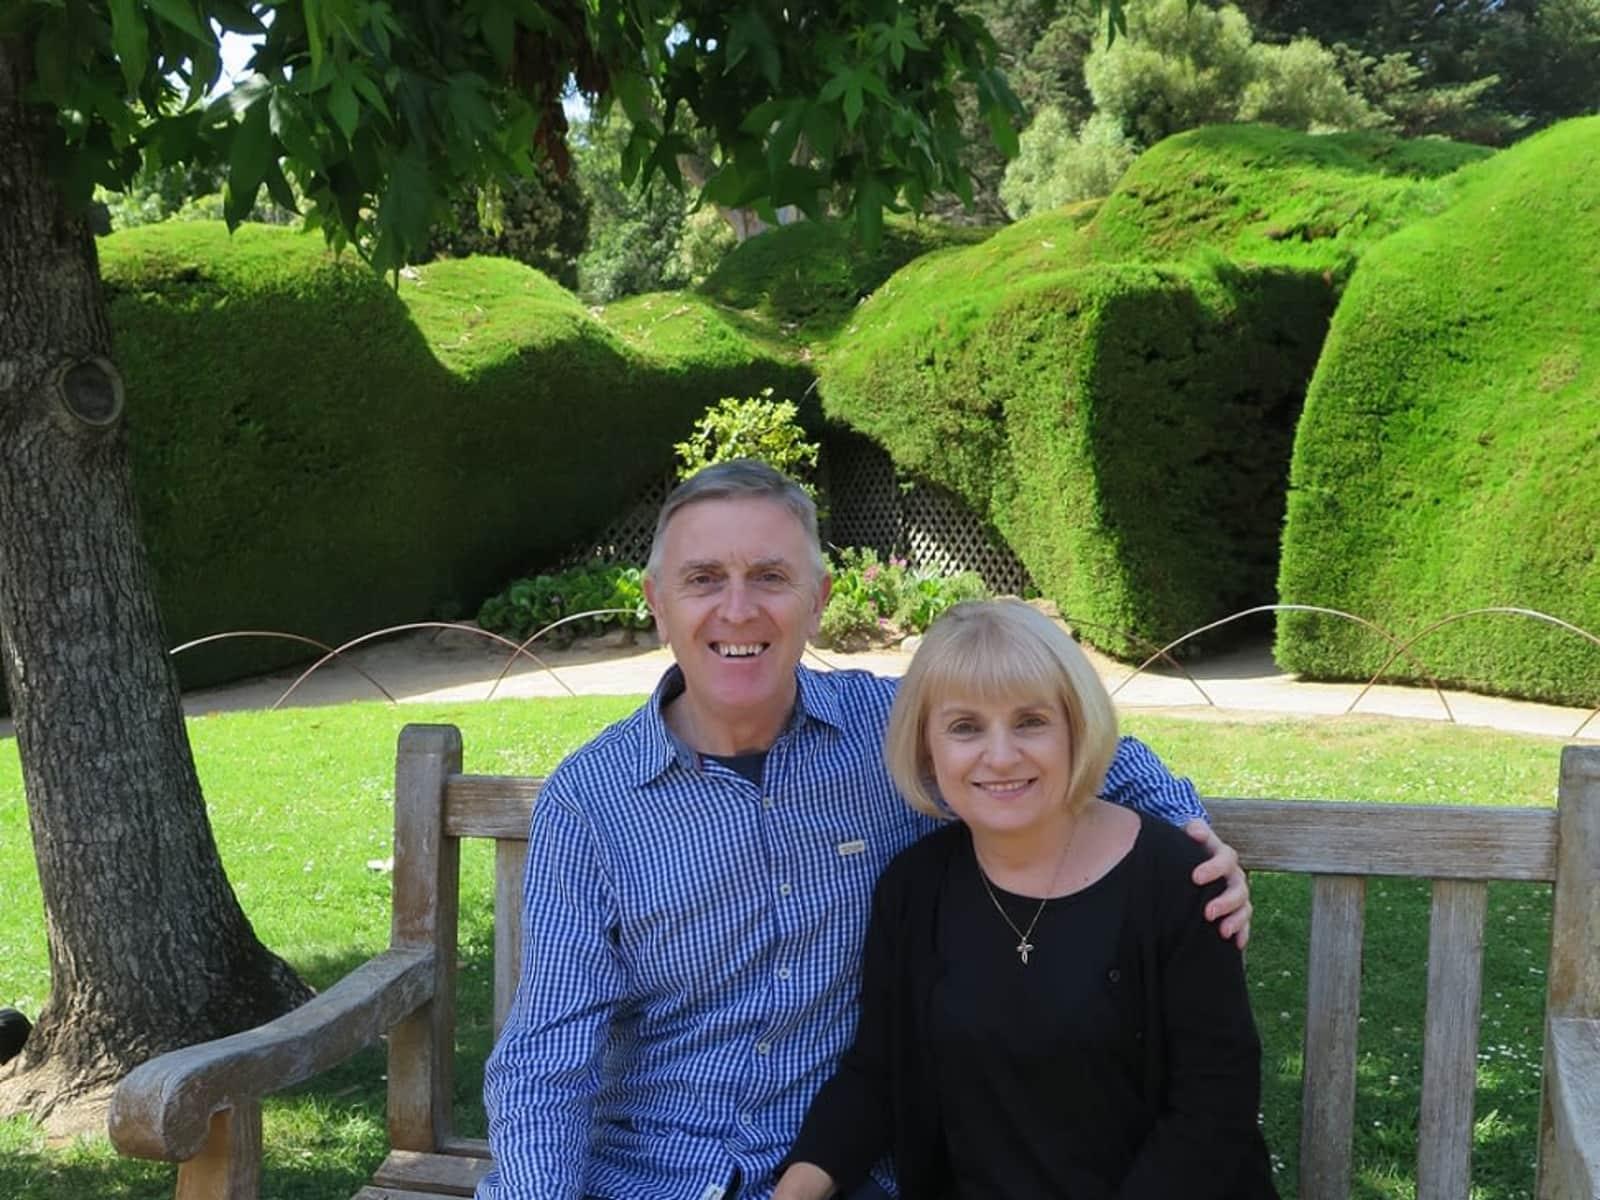 Branka & Paul from Chesterfield, United Kingdom